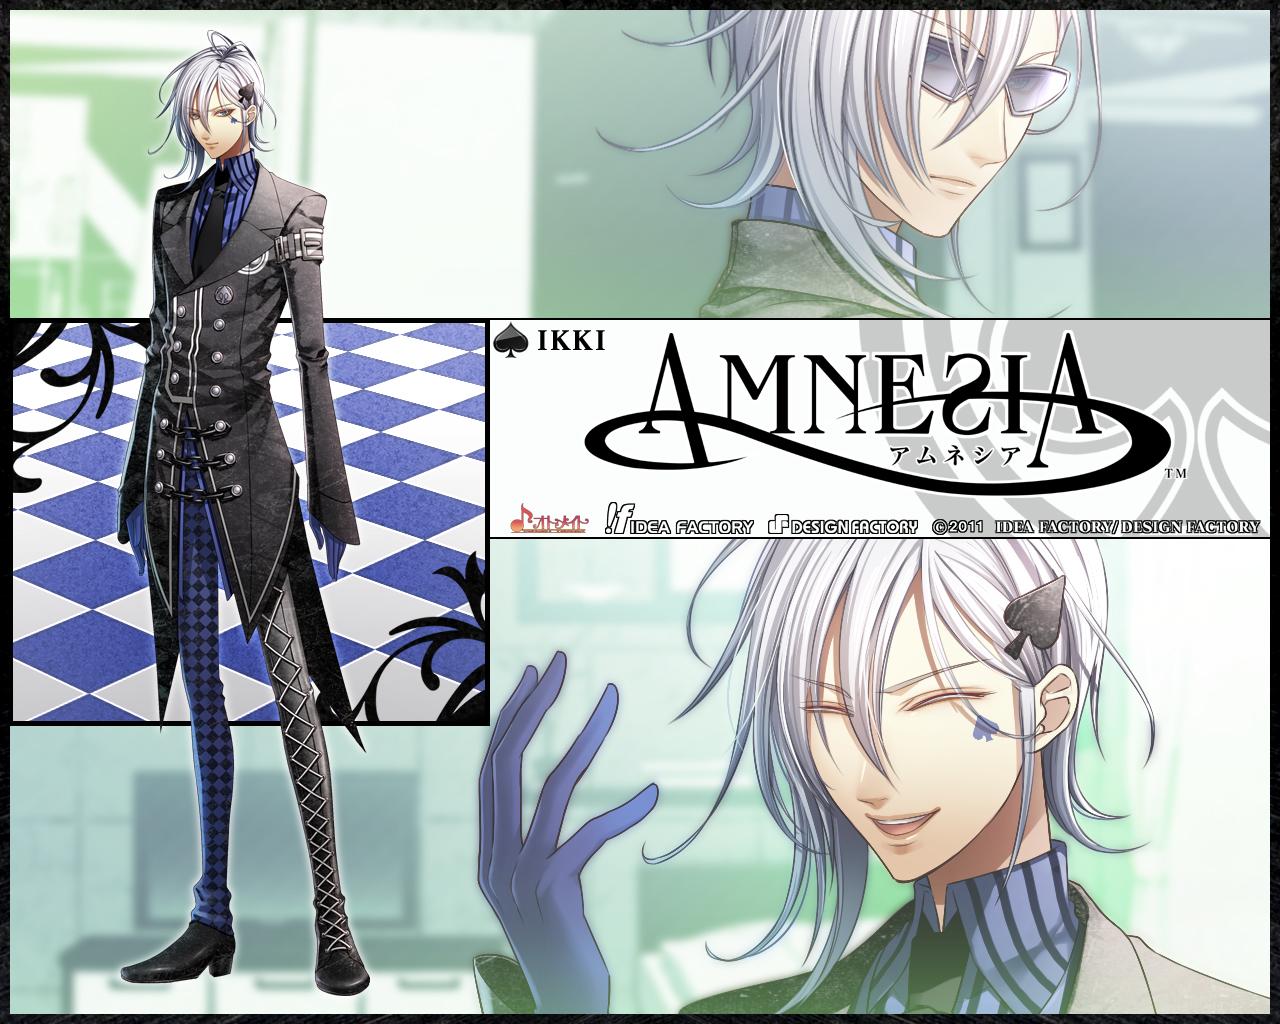 Ikkyu Amnesia アムネシア 壁紙 ファンポップ